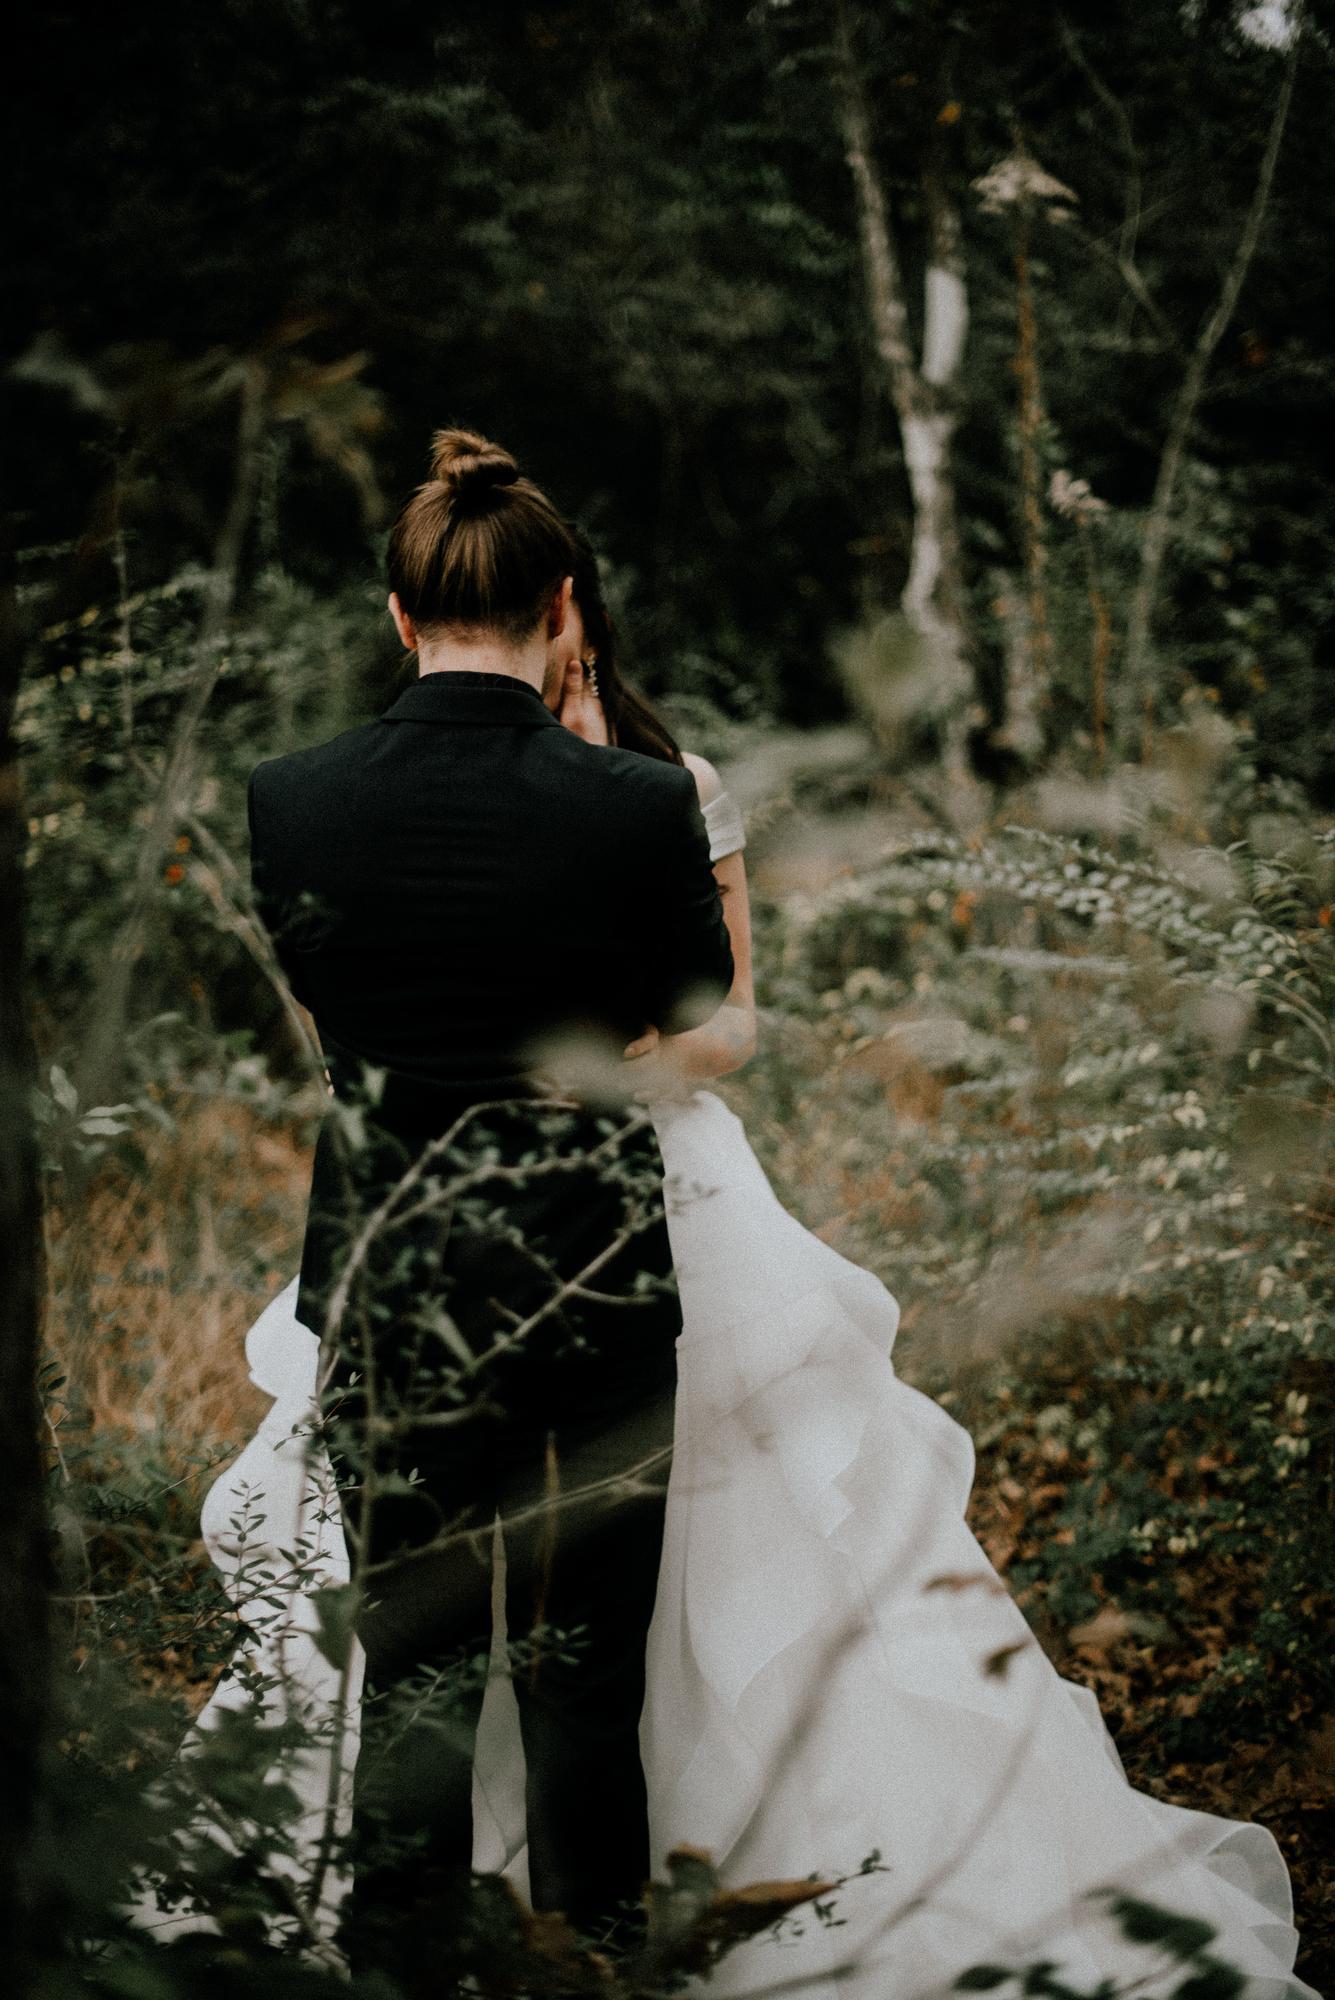 ofRen_weddingPhotos027.JPG